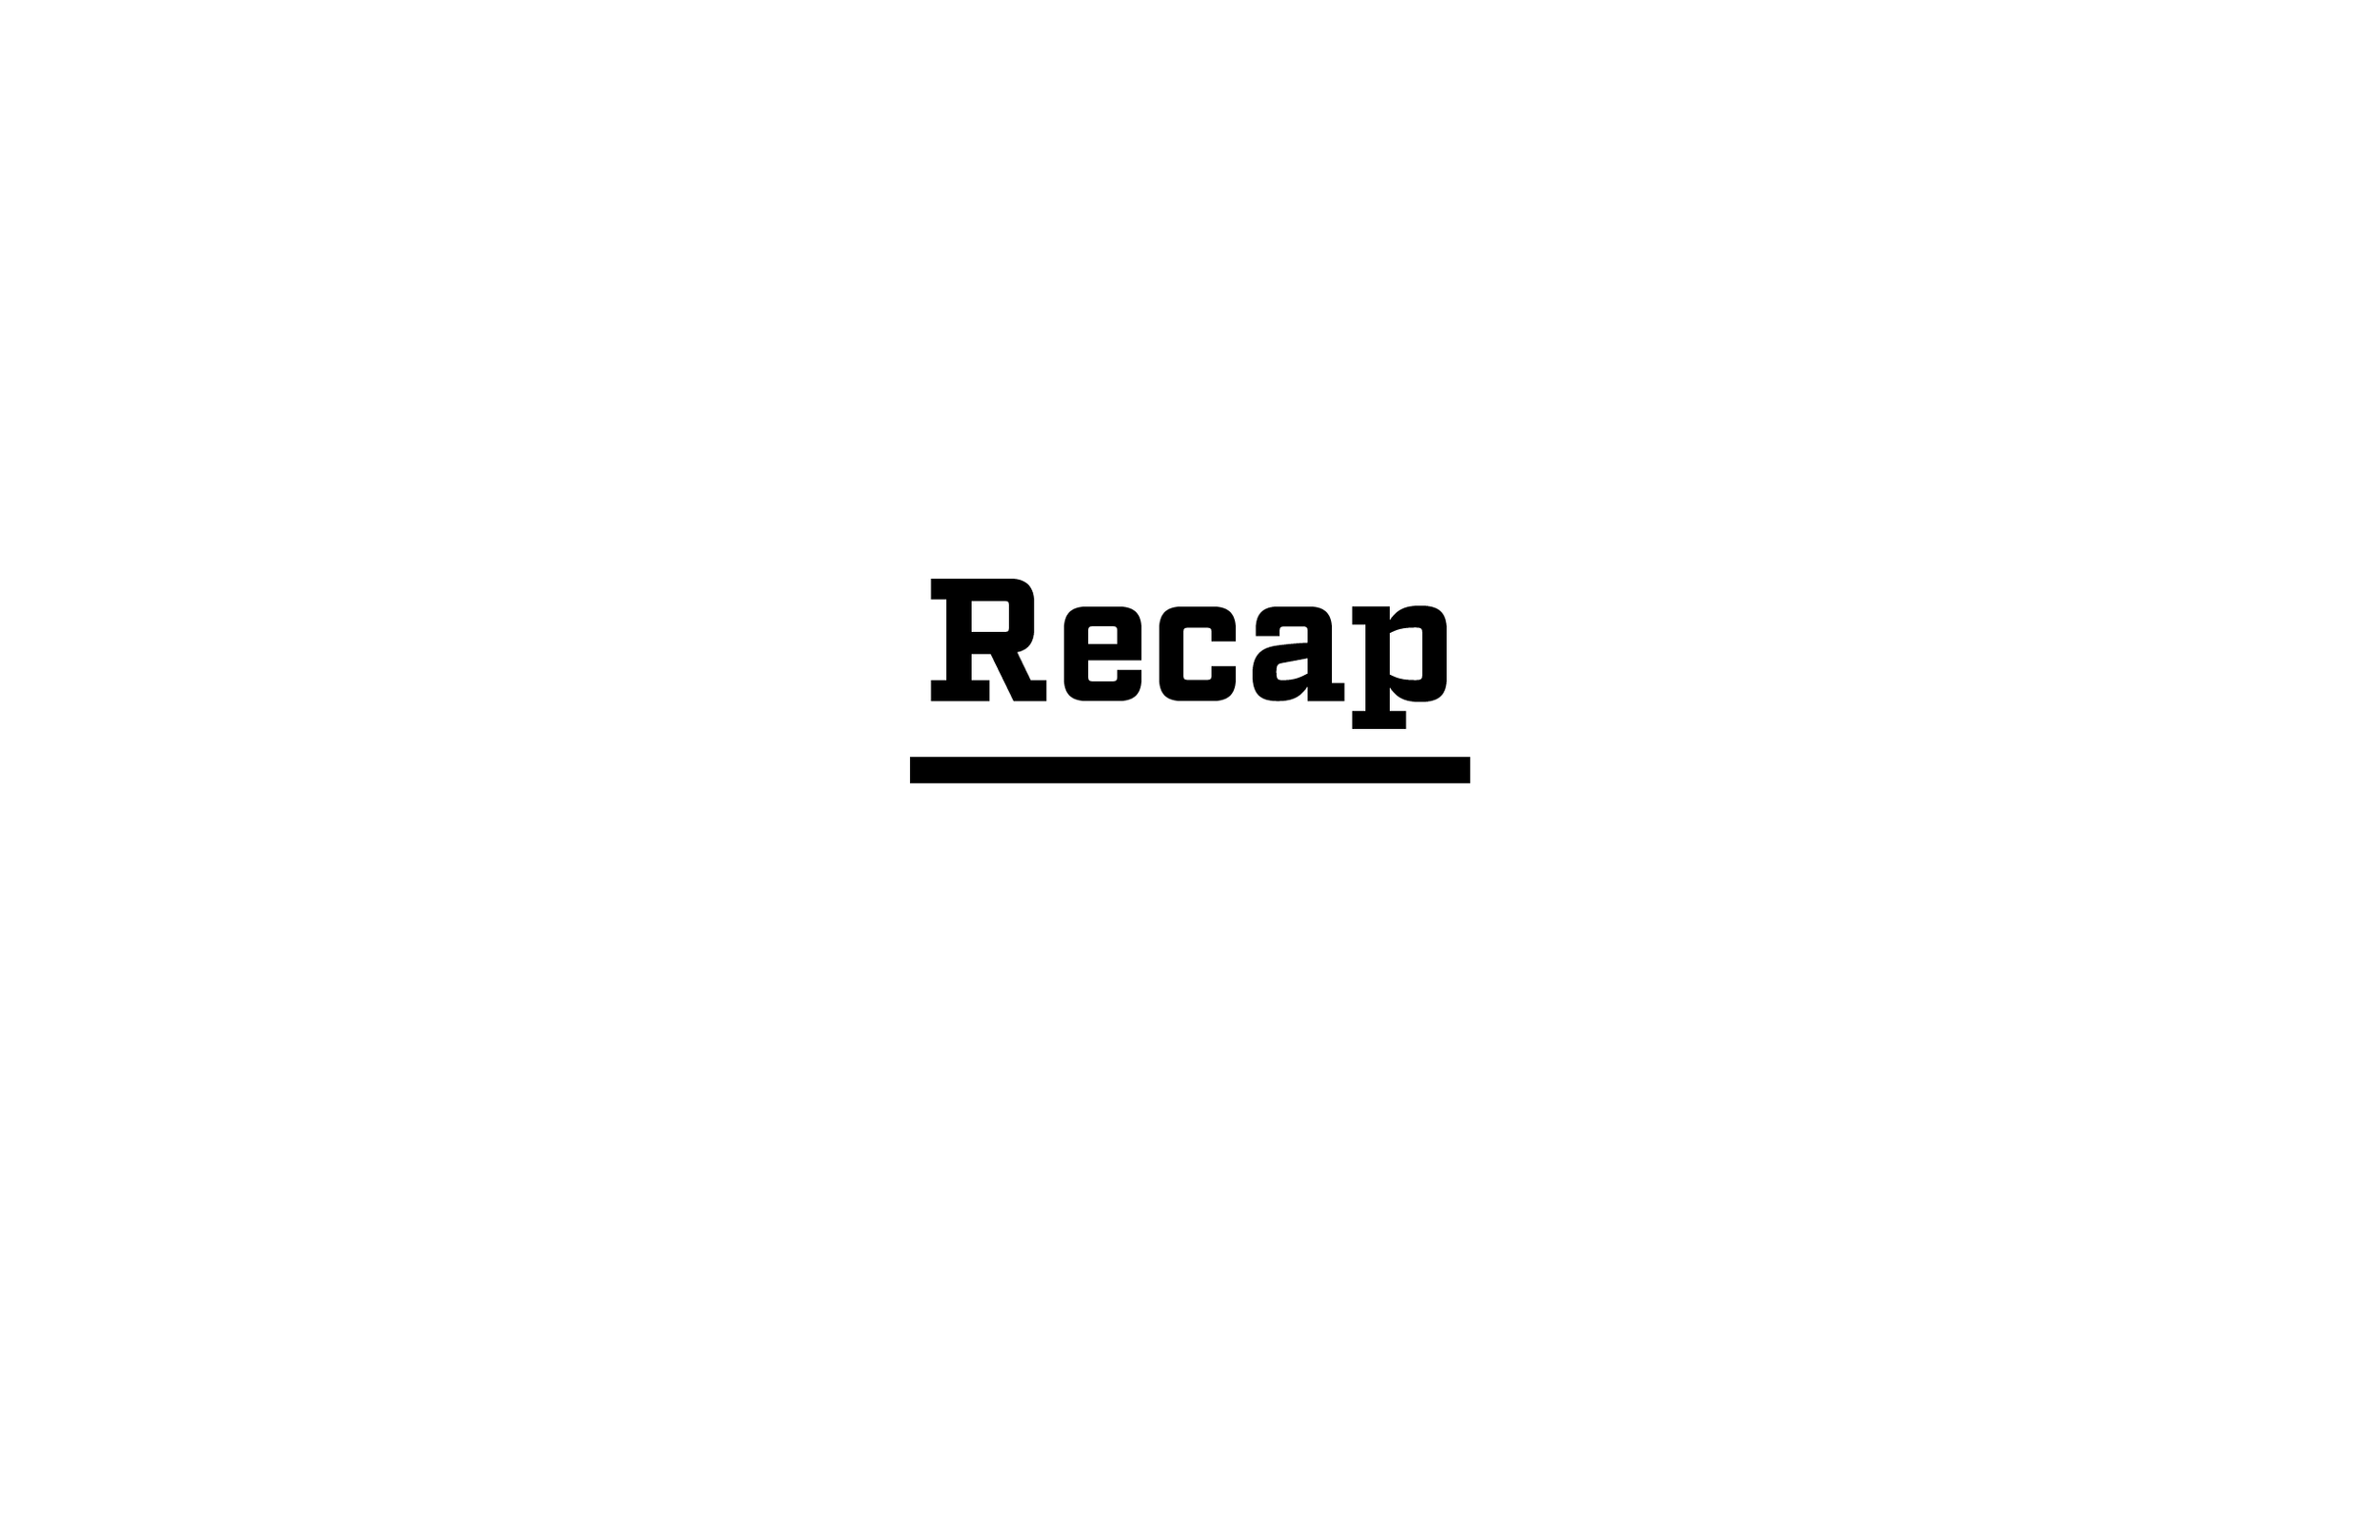 RAP_FA18_Week5_1-23.png